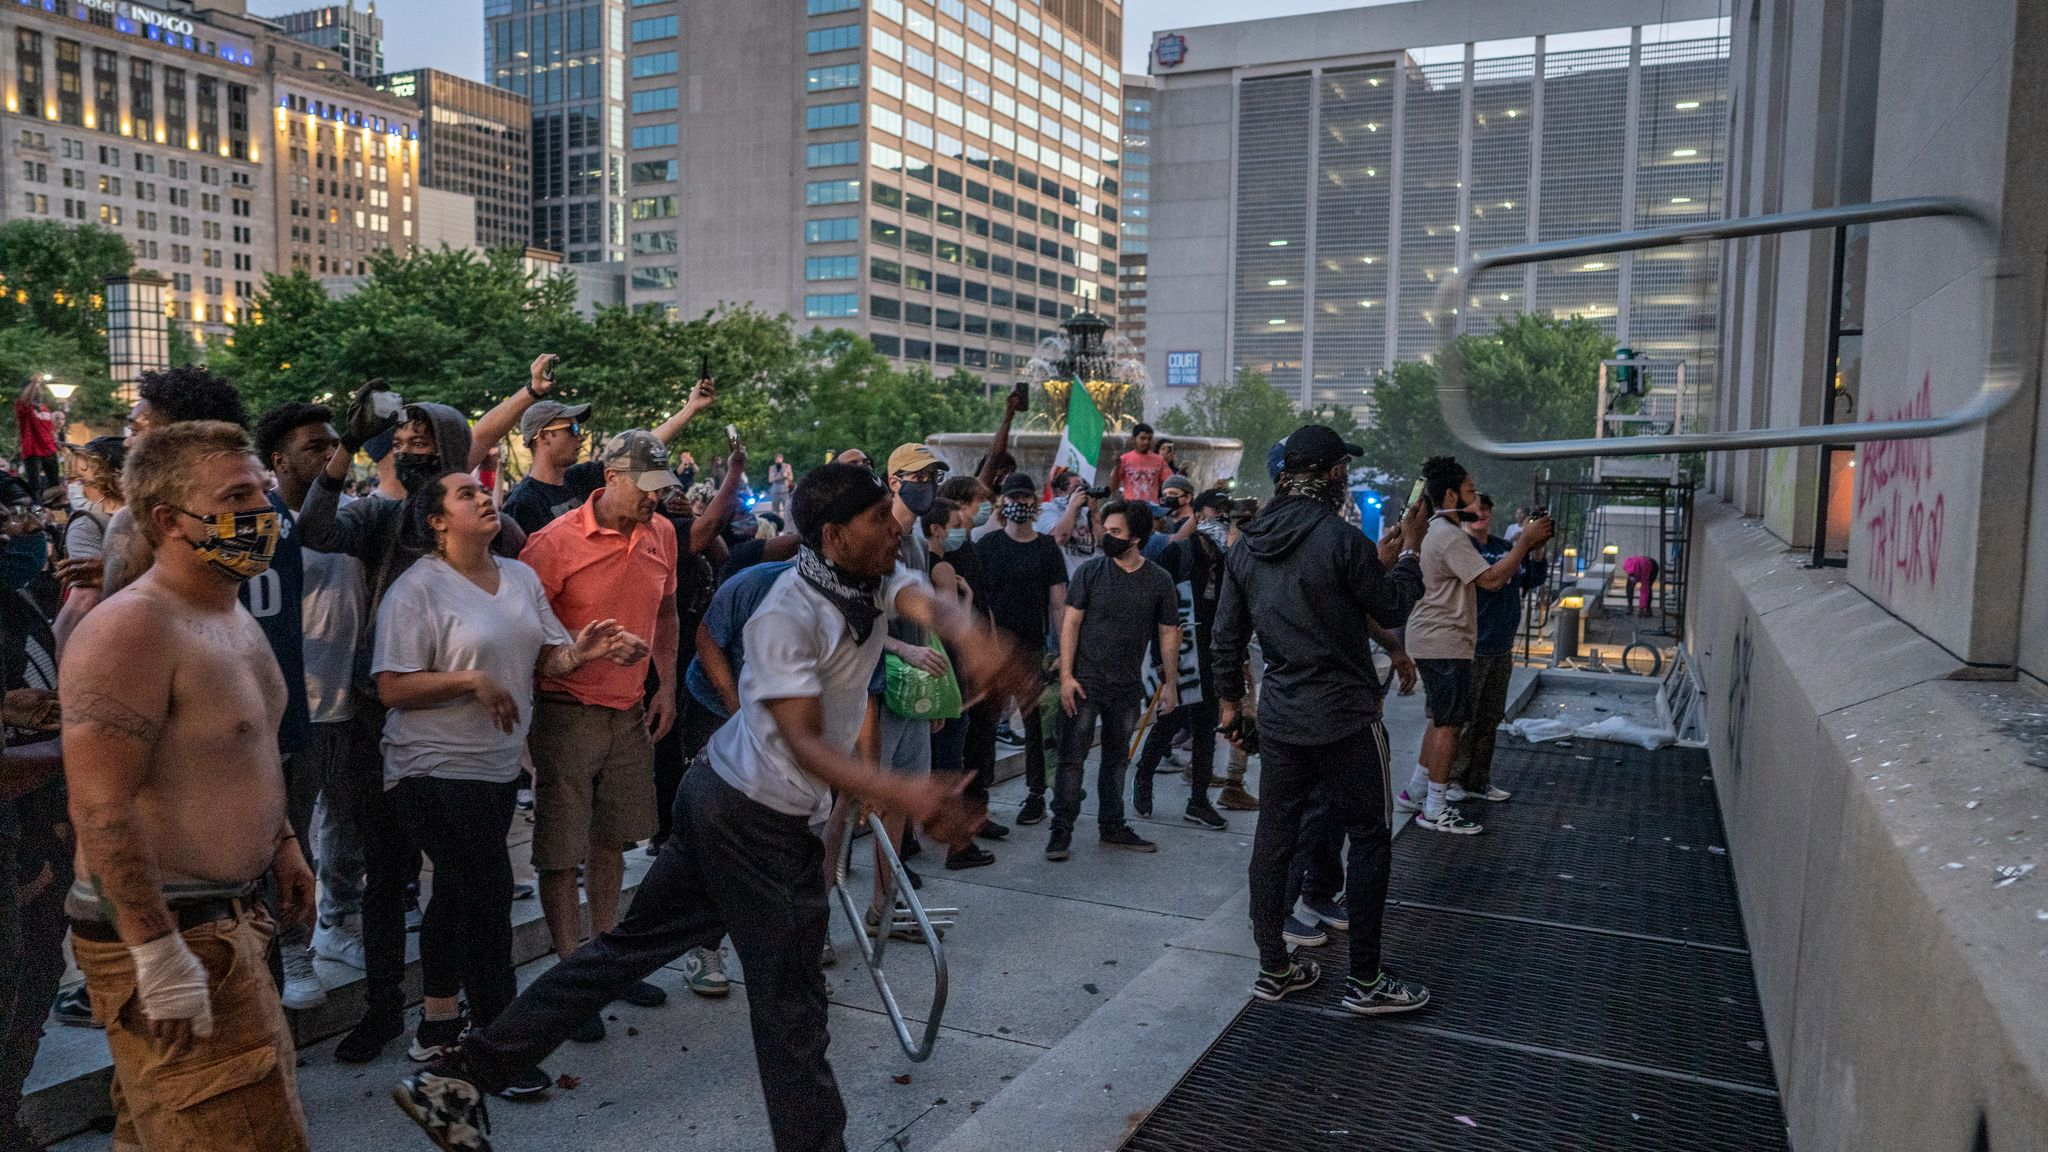 Nashville, Tenn., May 30 - Protestors throw objects at Historic Metro Courthouse windows. (Photo: John Partipilo)